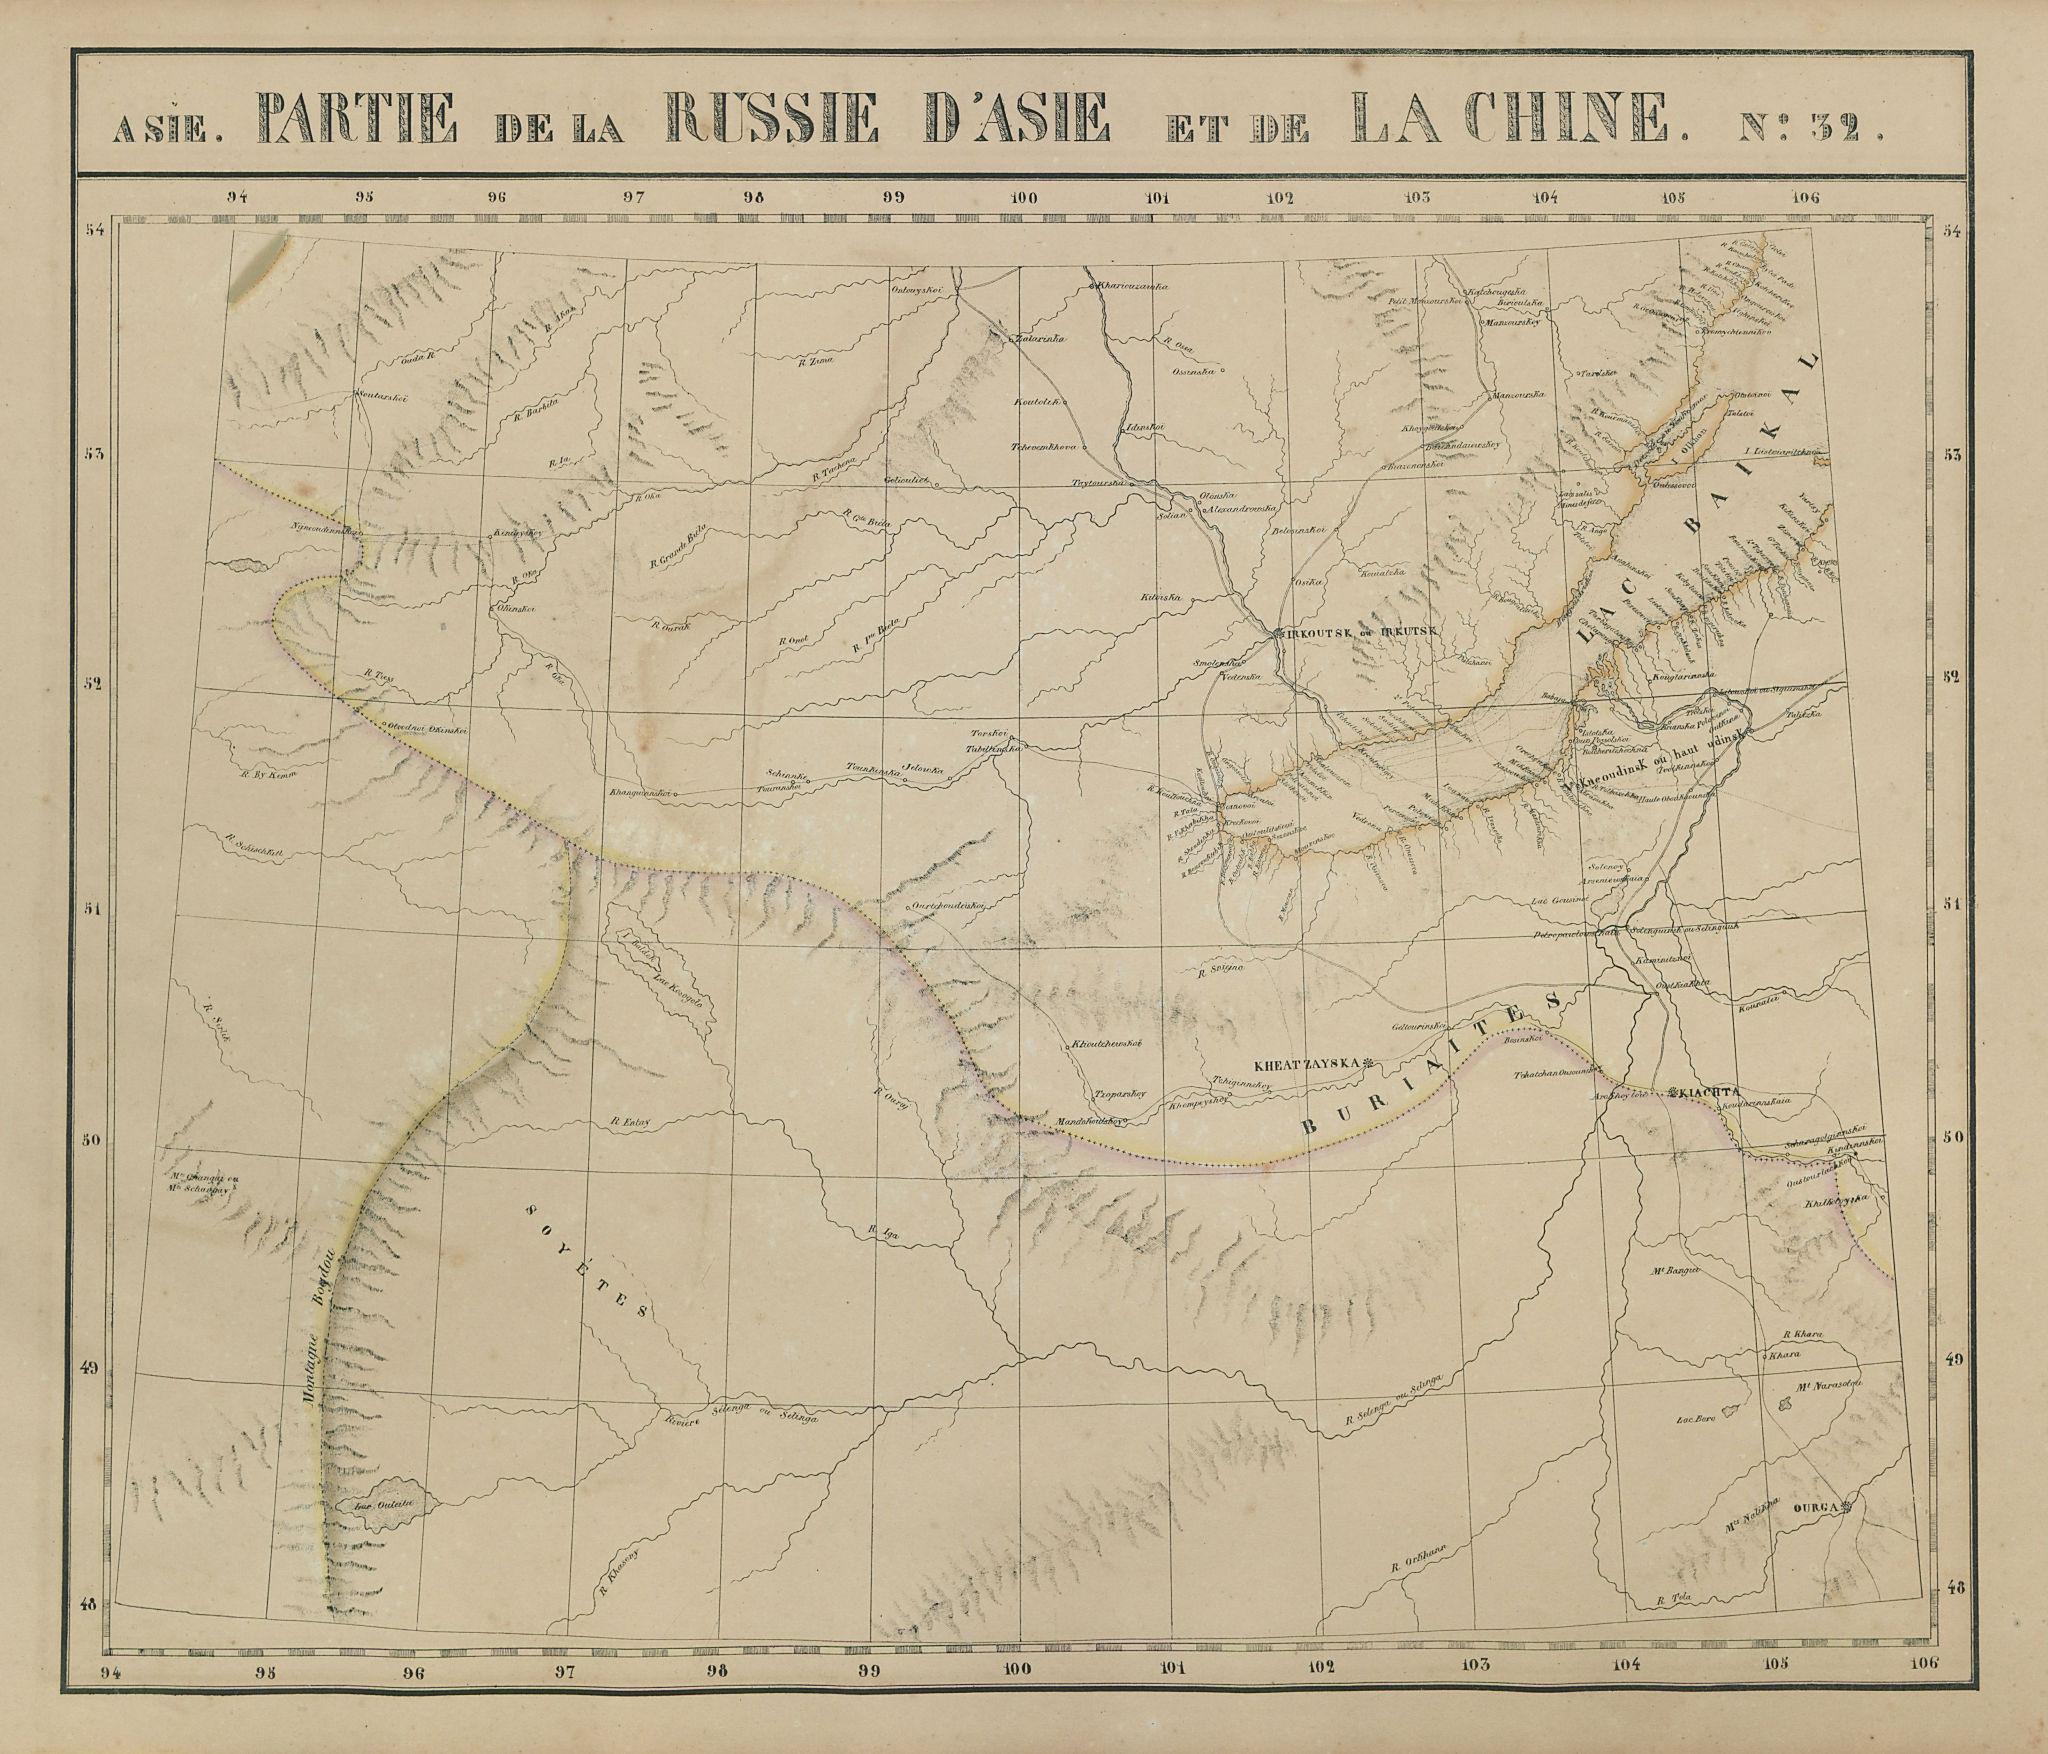 Russie d'Asie & Chine #32 Lake Baikal. Russia Mongolia VANDERMAELEN 1827 map